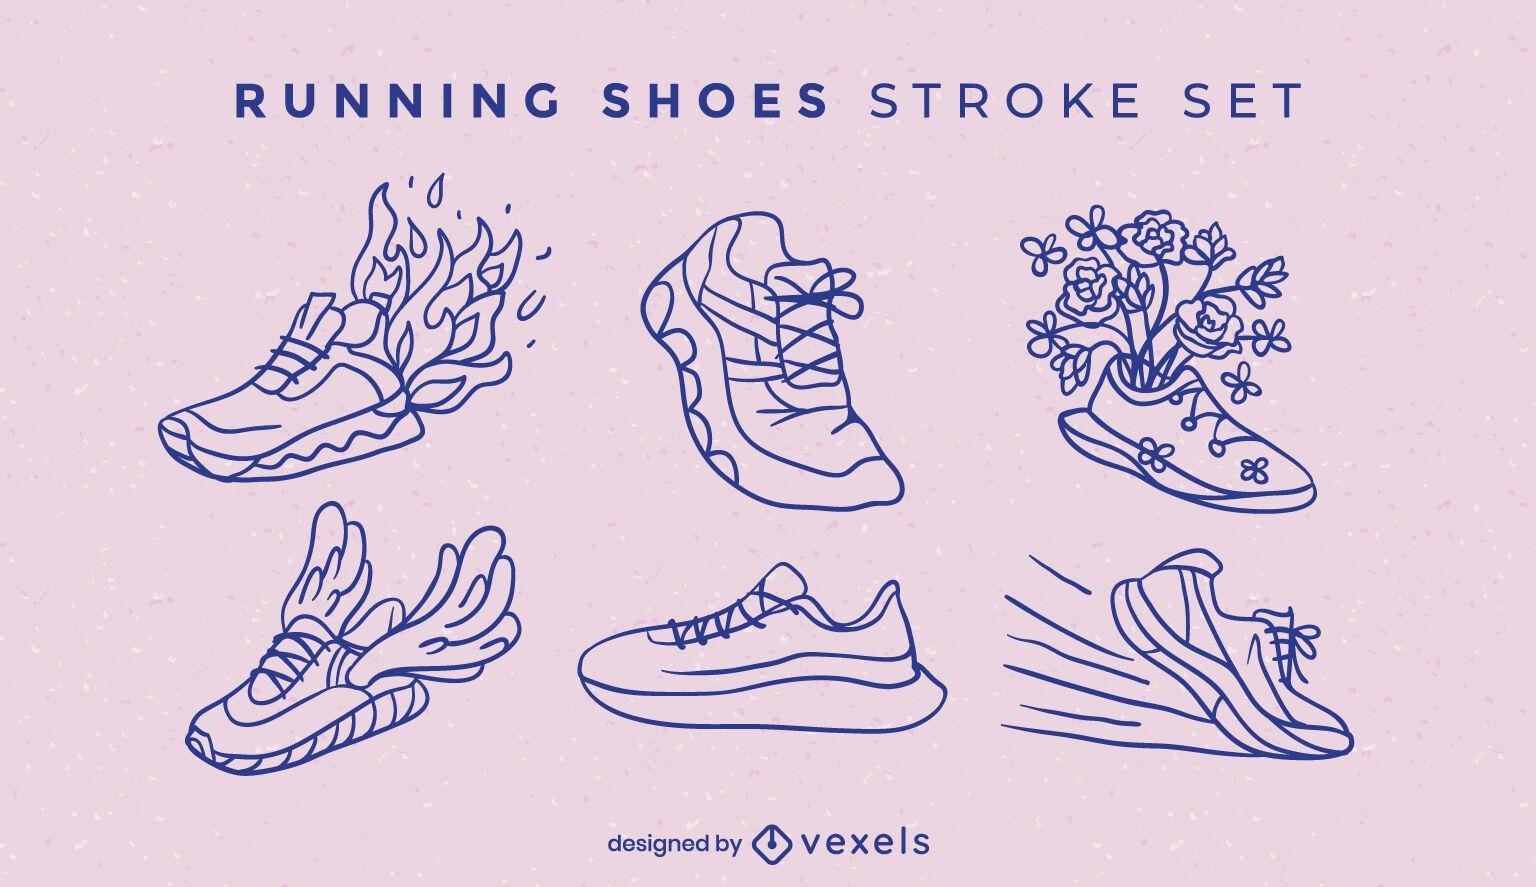 Running shoes stroke set